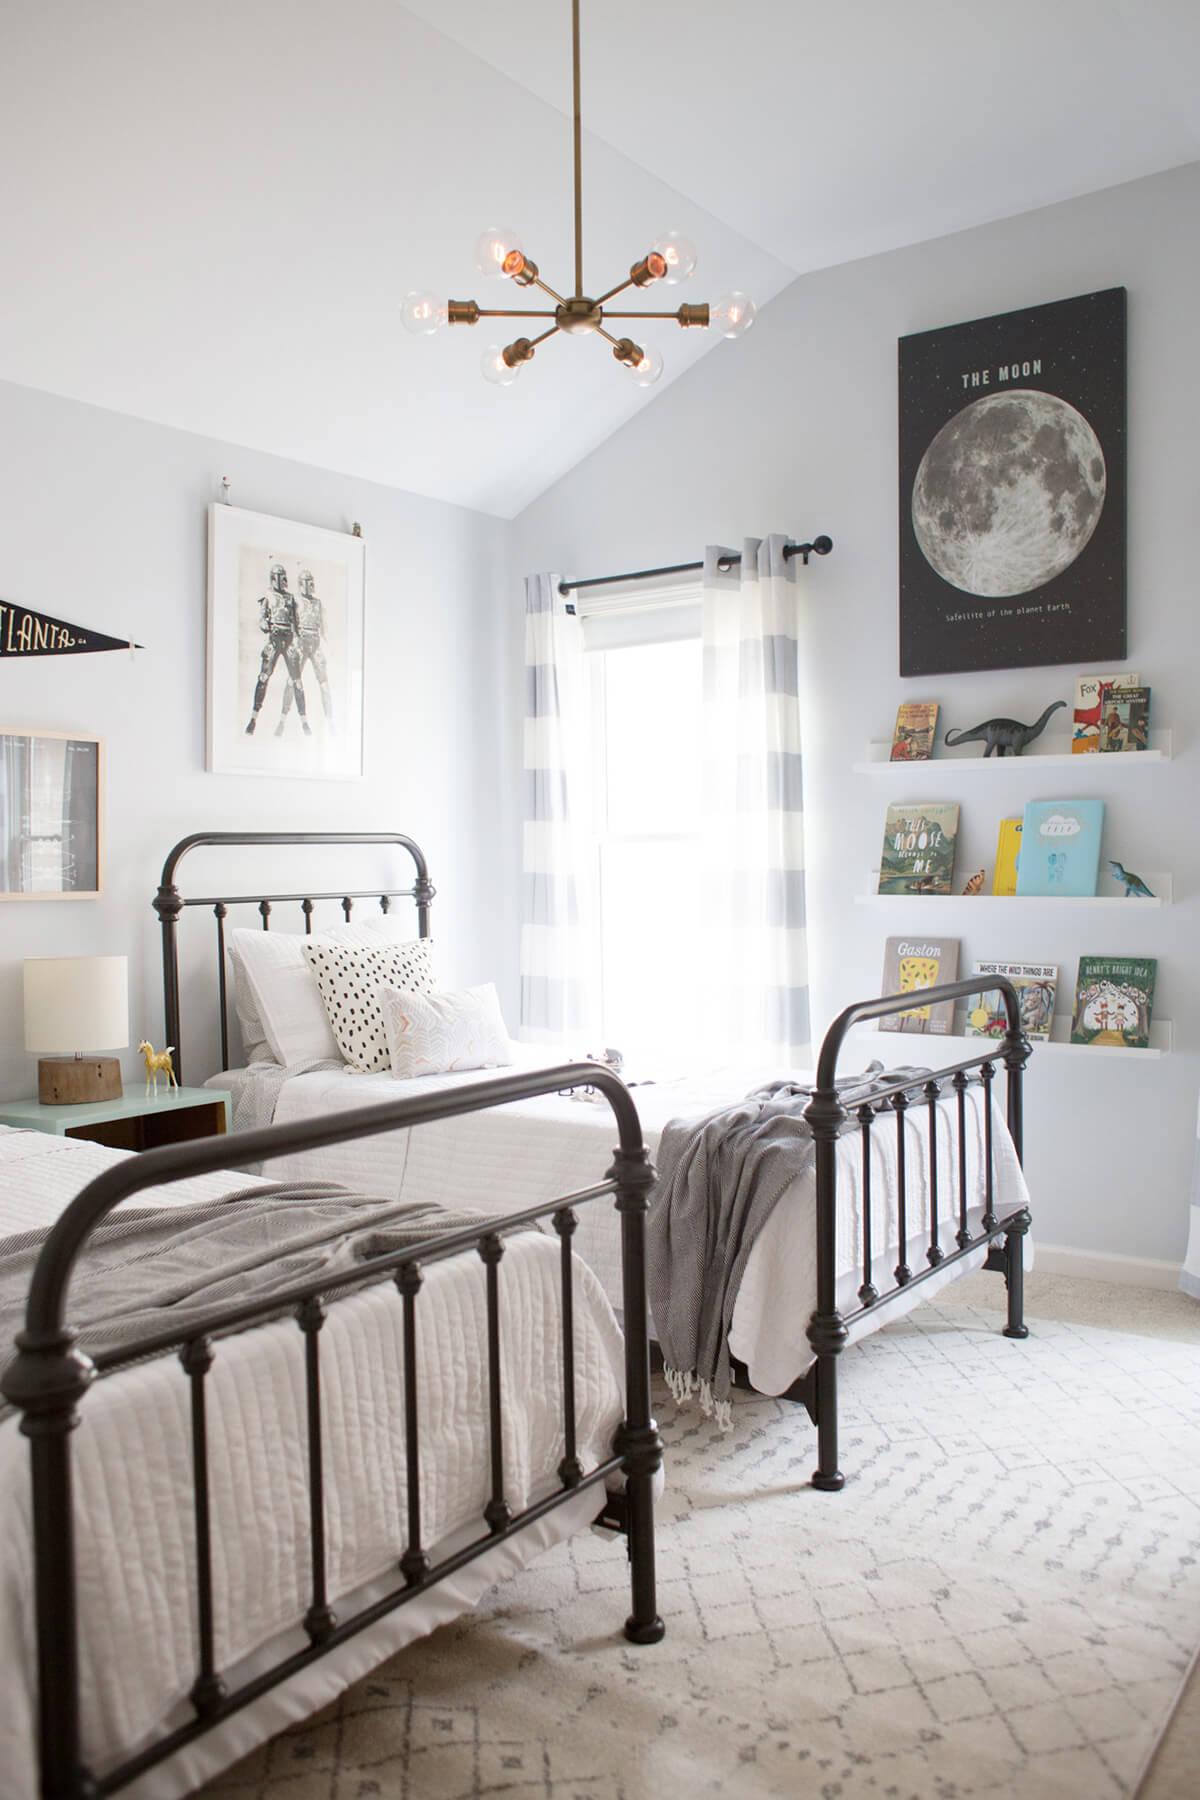 16-teenage-boy-room-decor-ideas-homebnc — Homebnc on Teenage Room Ideas Boy  id=33958